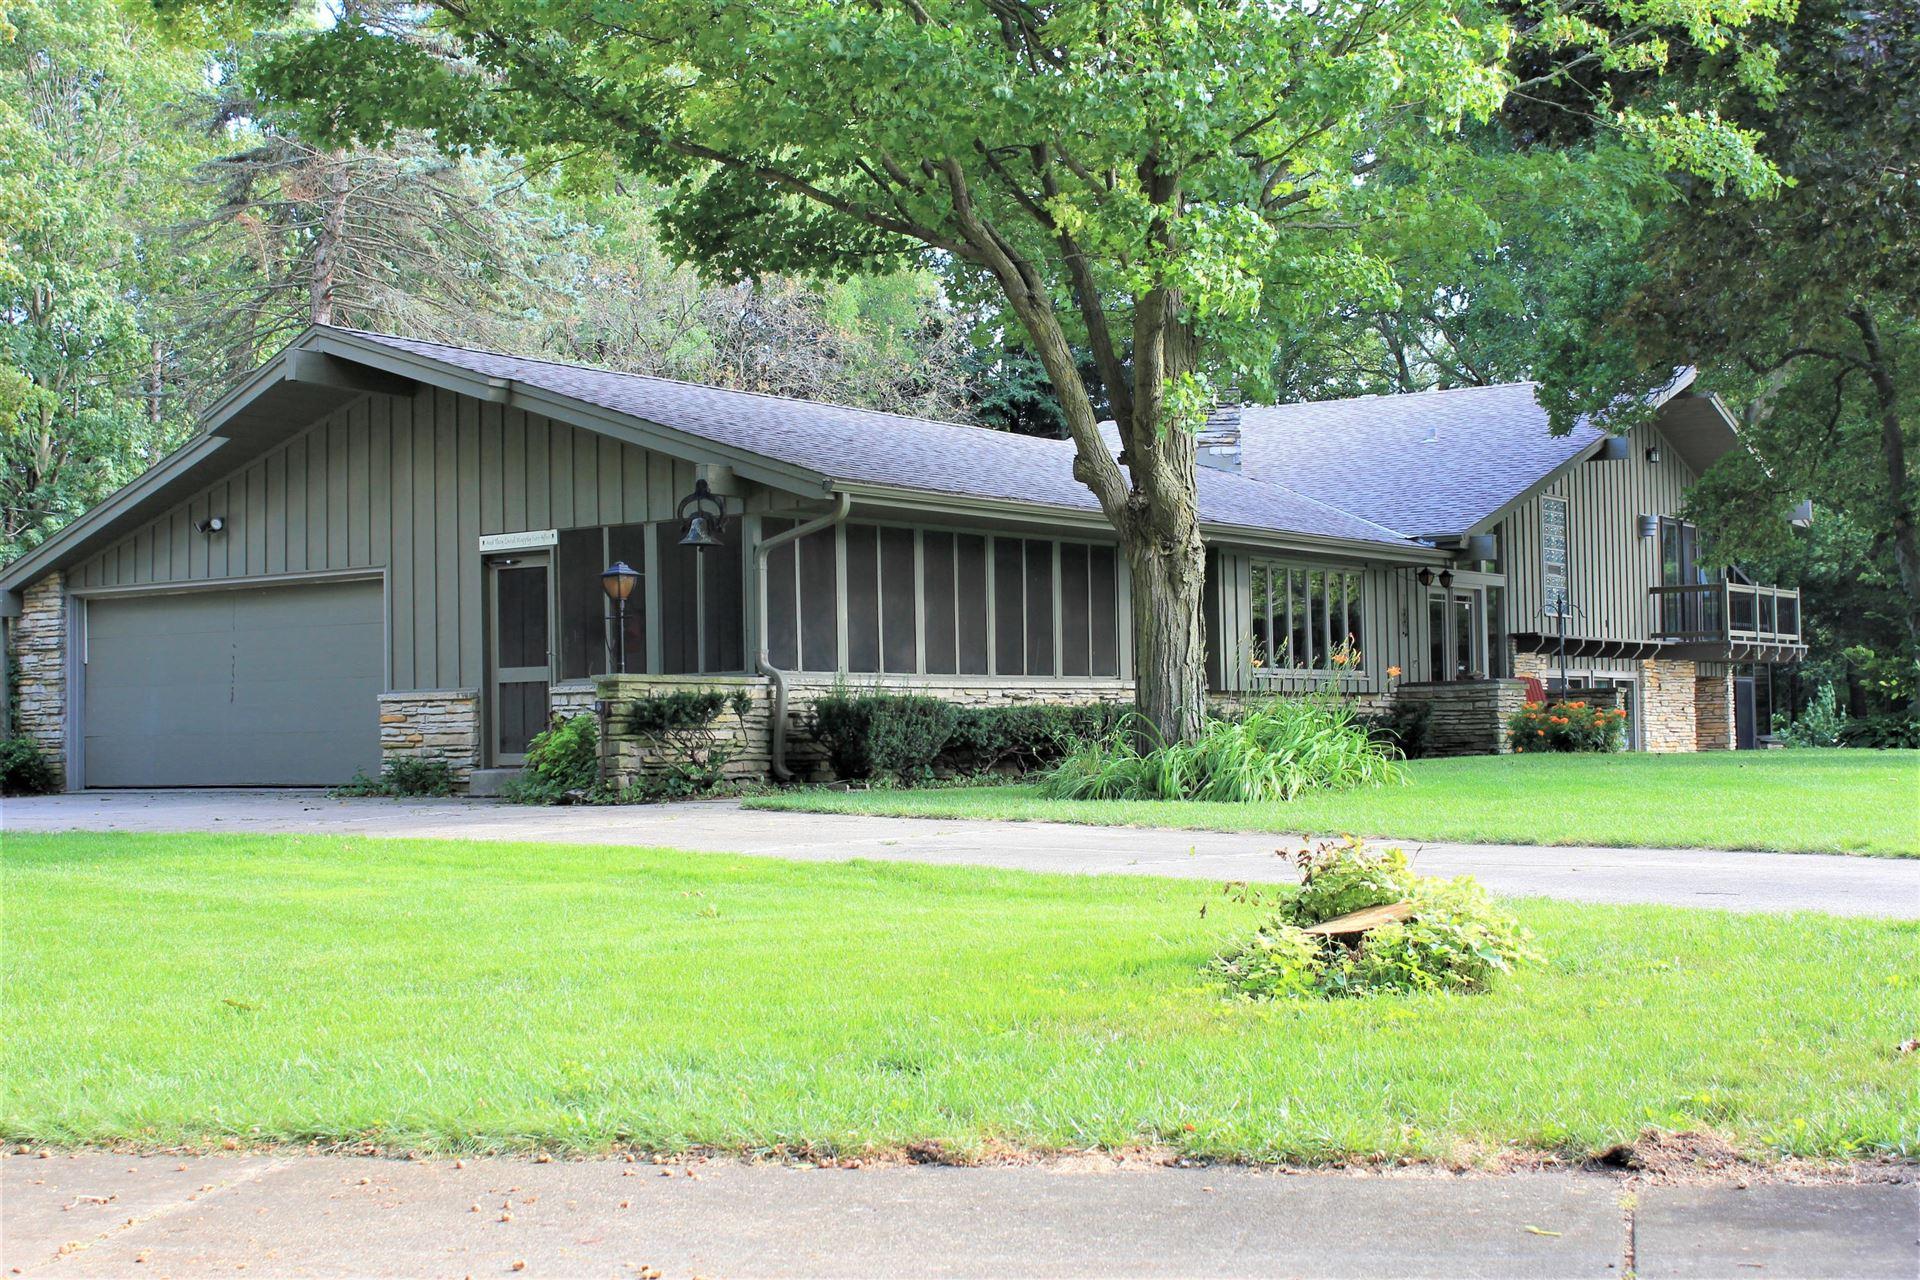 7921 Gittings Rd, Mount Pleasant, WI 53406 - #: 1676050